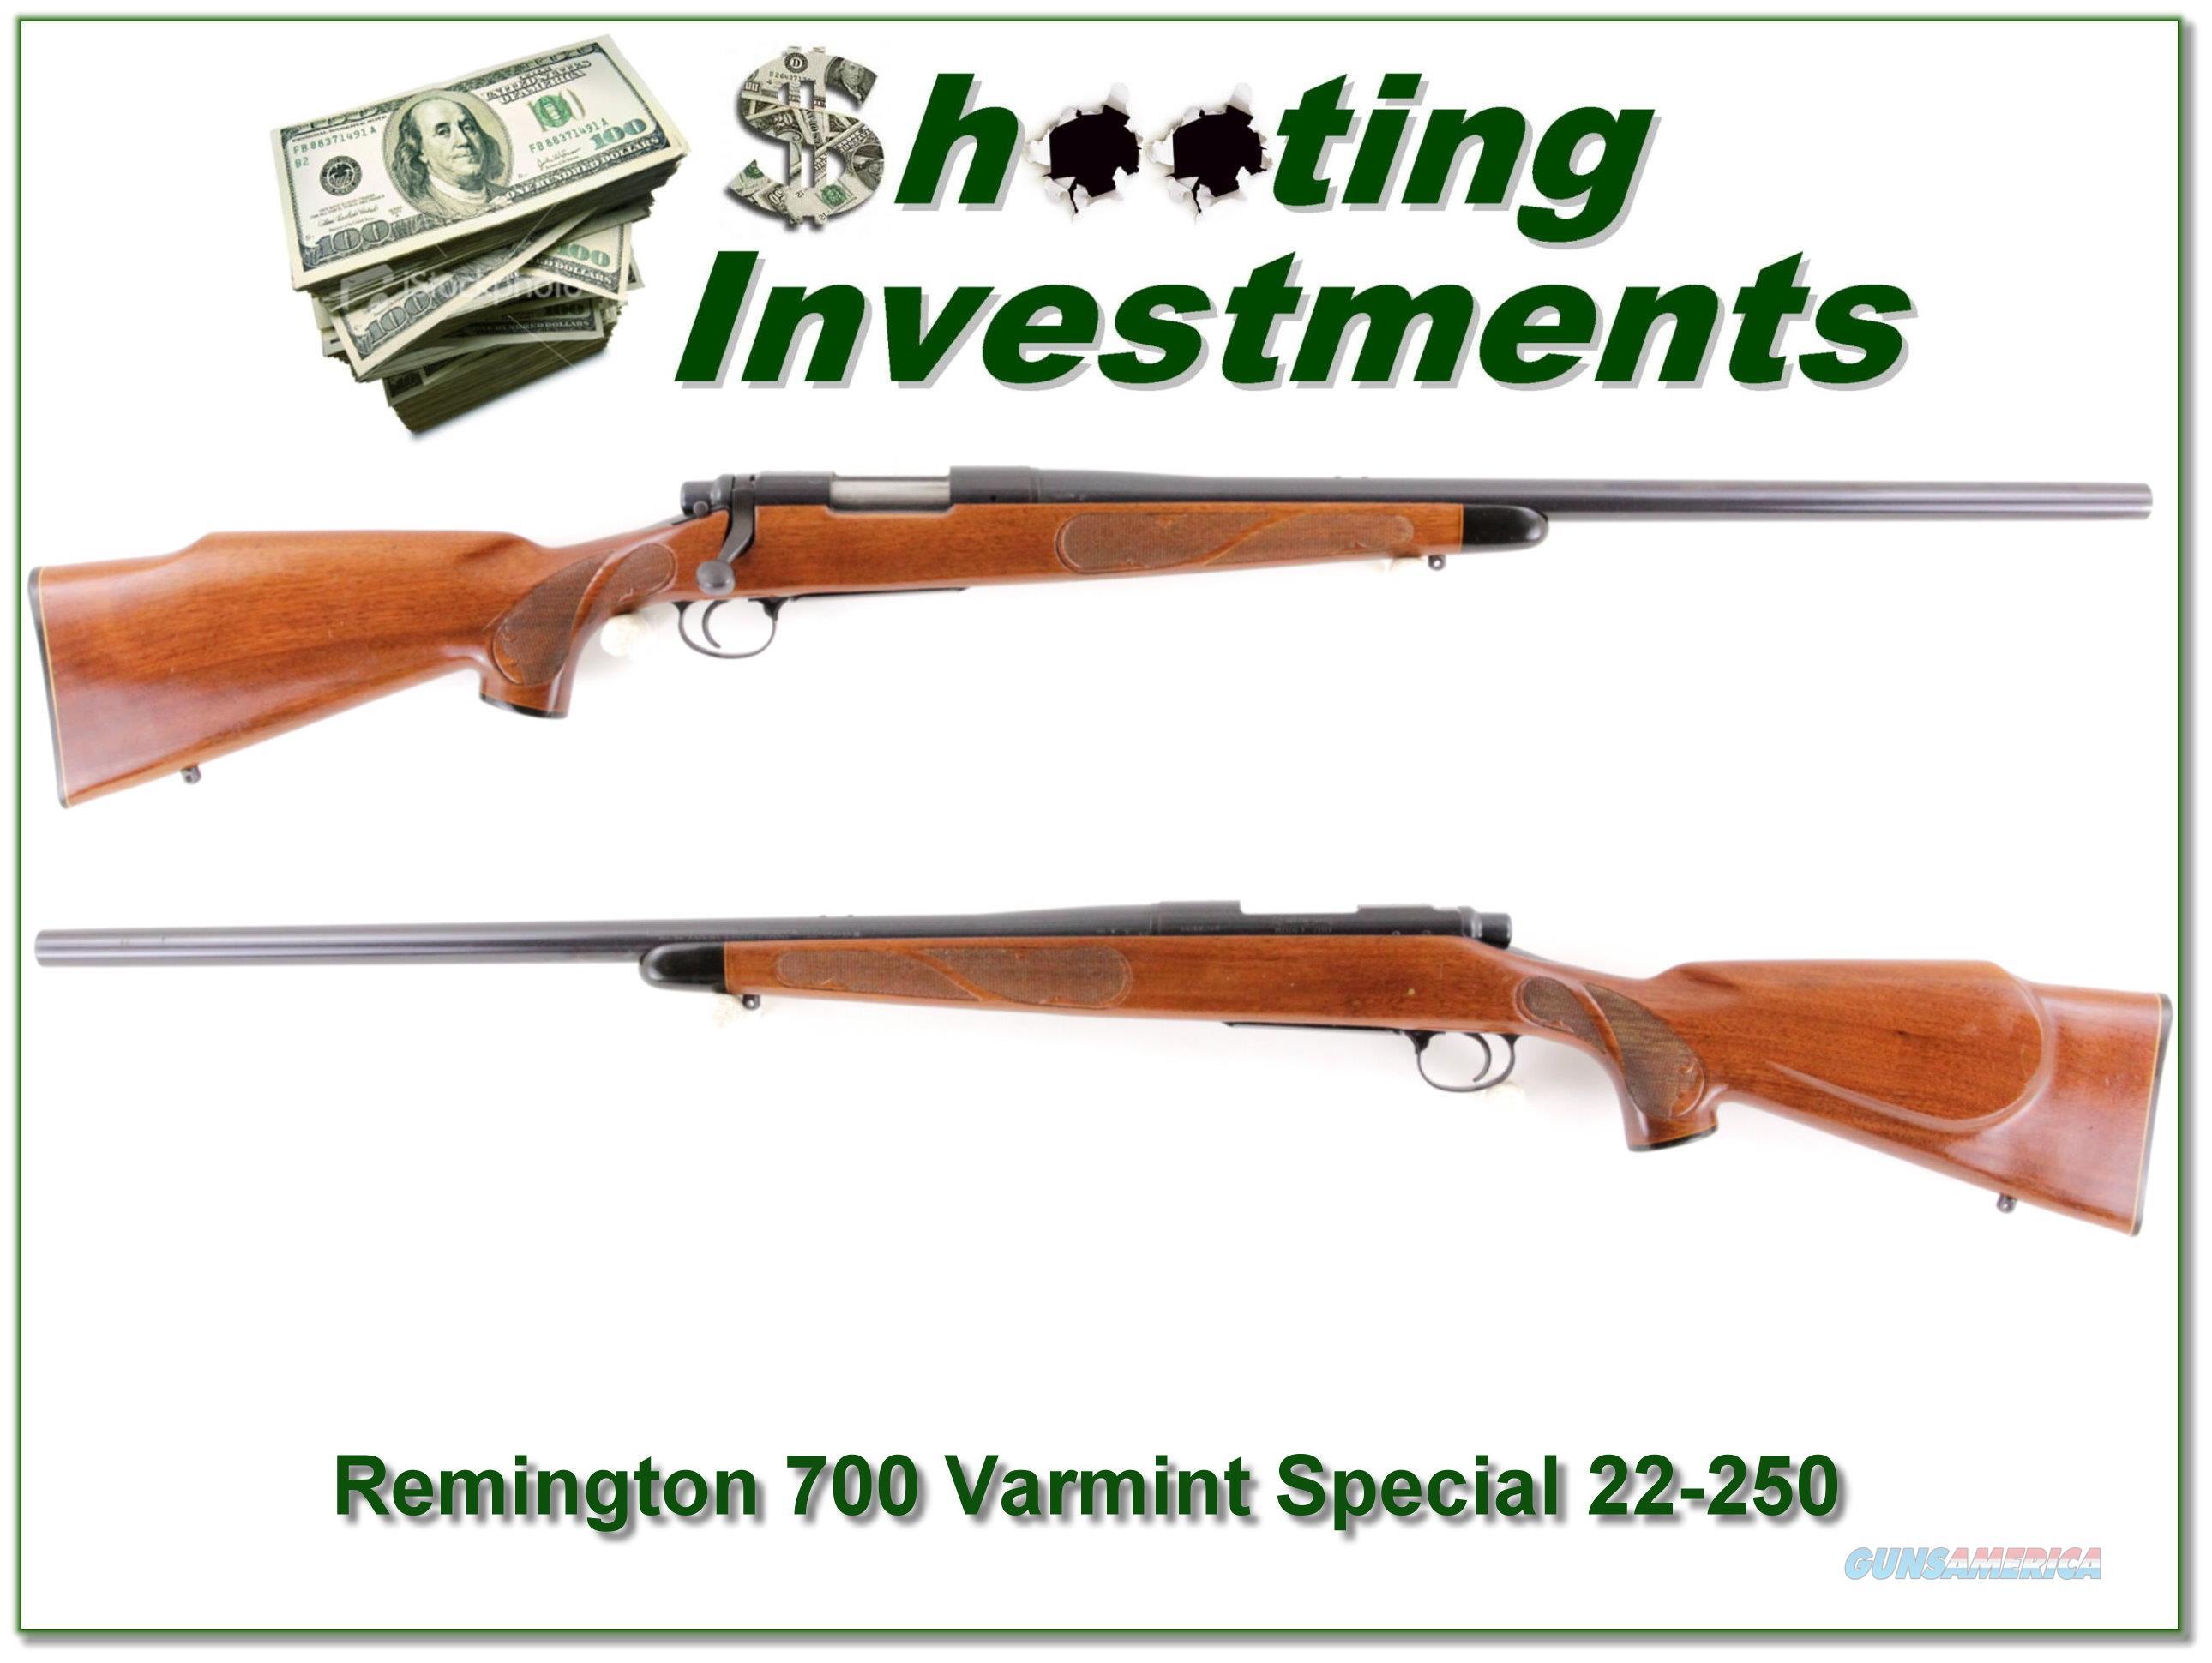 Remington 700 Varmint Special 22-250 Remington  Guns > Rifles > Remington Rifles - Modern > Model 700 > Sporting